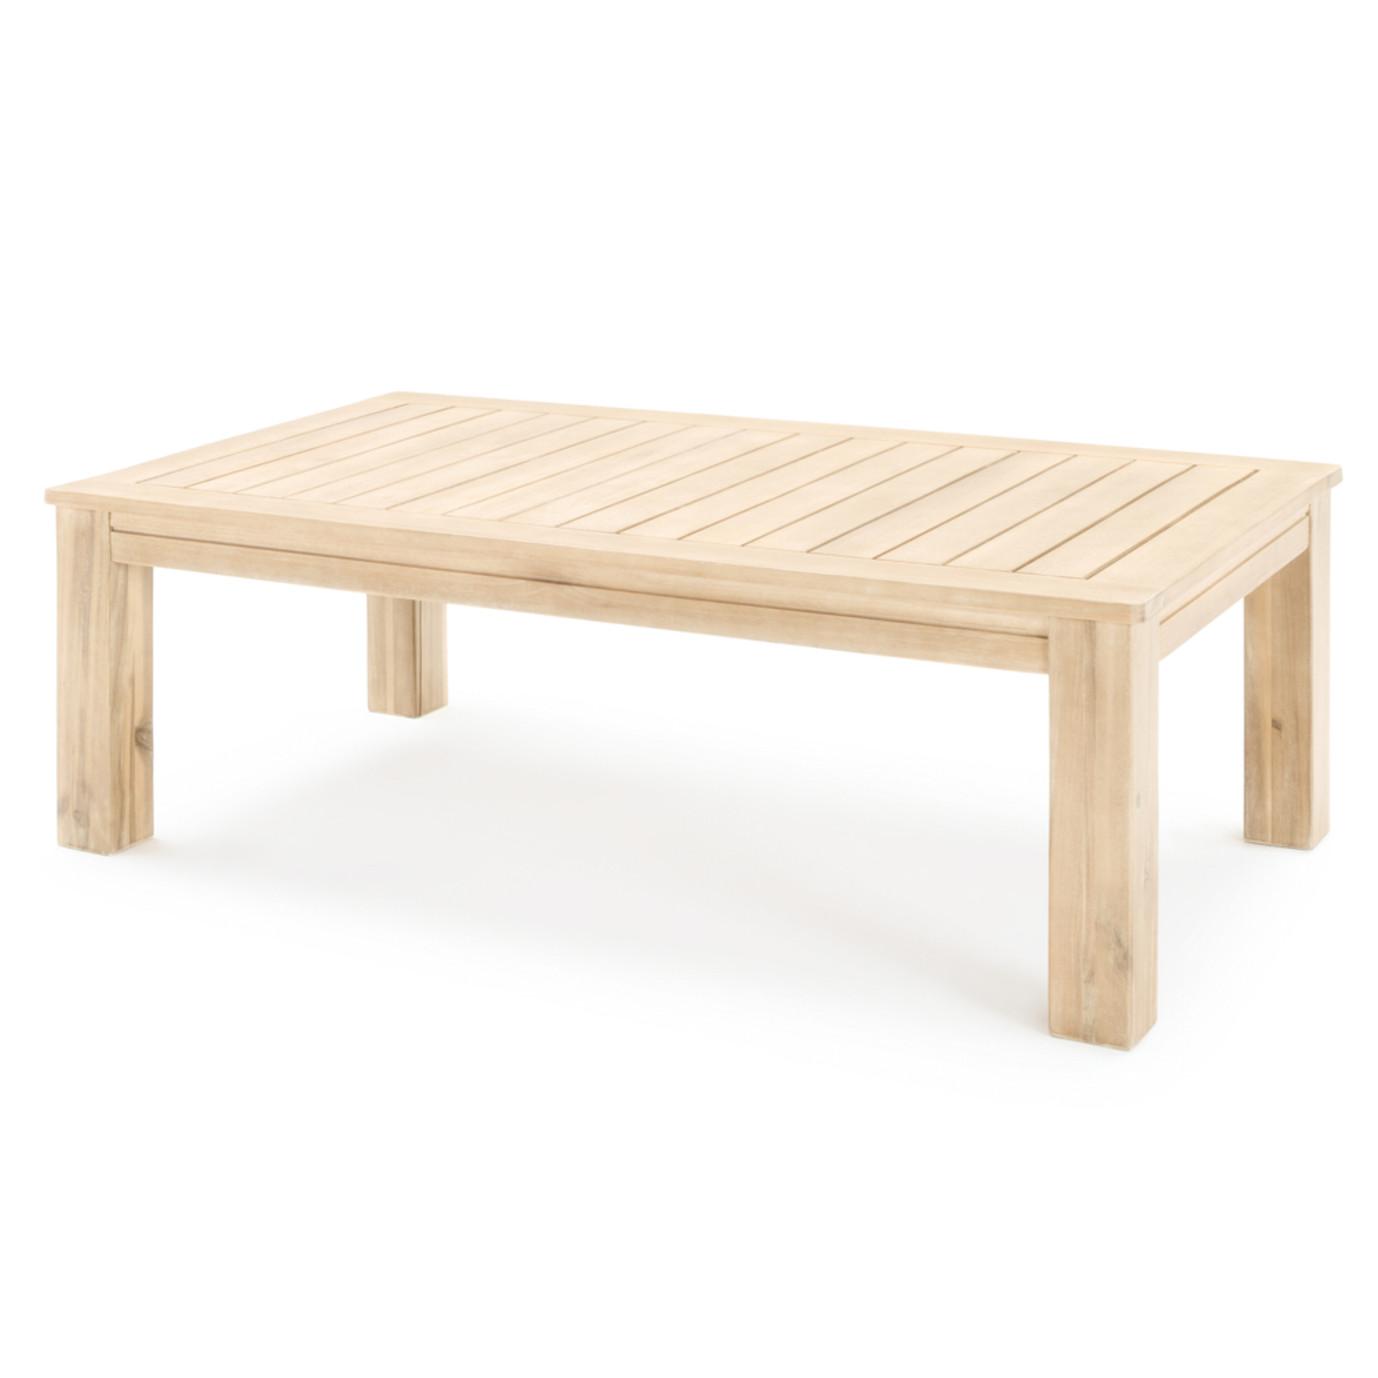 Kooper 9 Piece Seating Set - Bliss Blue